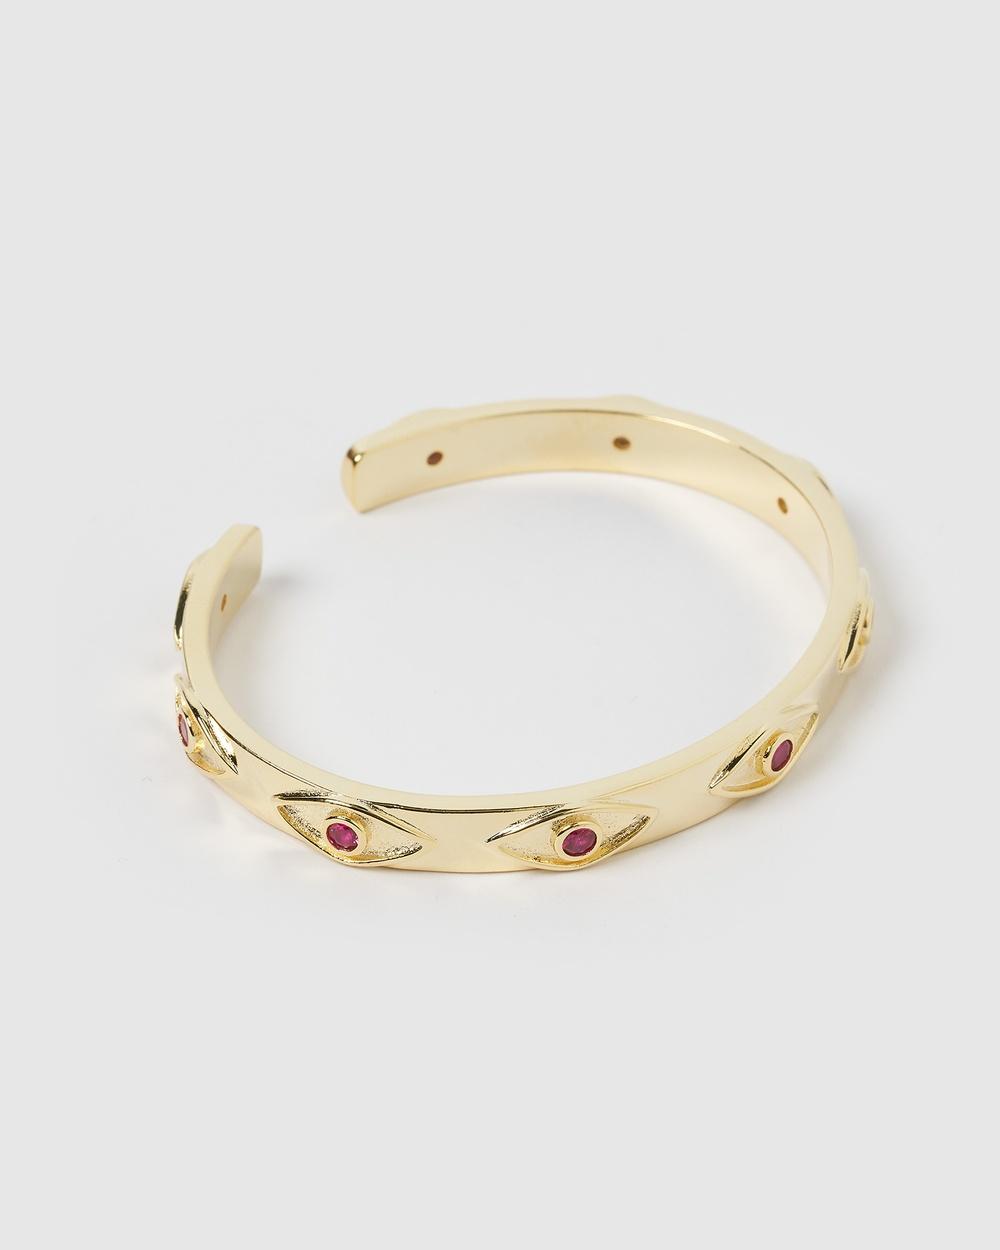 Izoa Malta Eye Pink Gold Cuff Bracelet Jewellery Gold